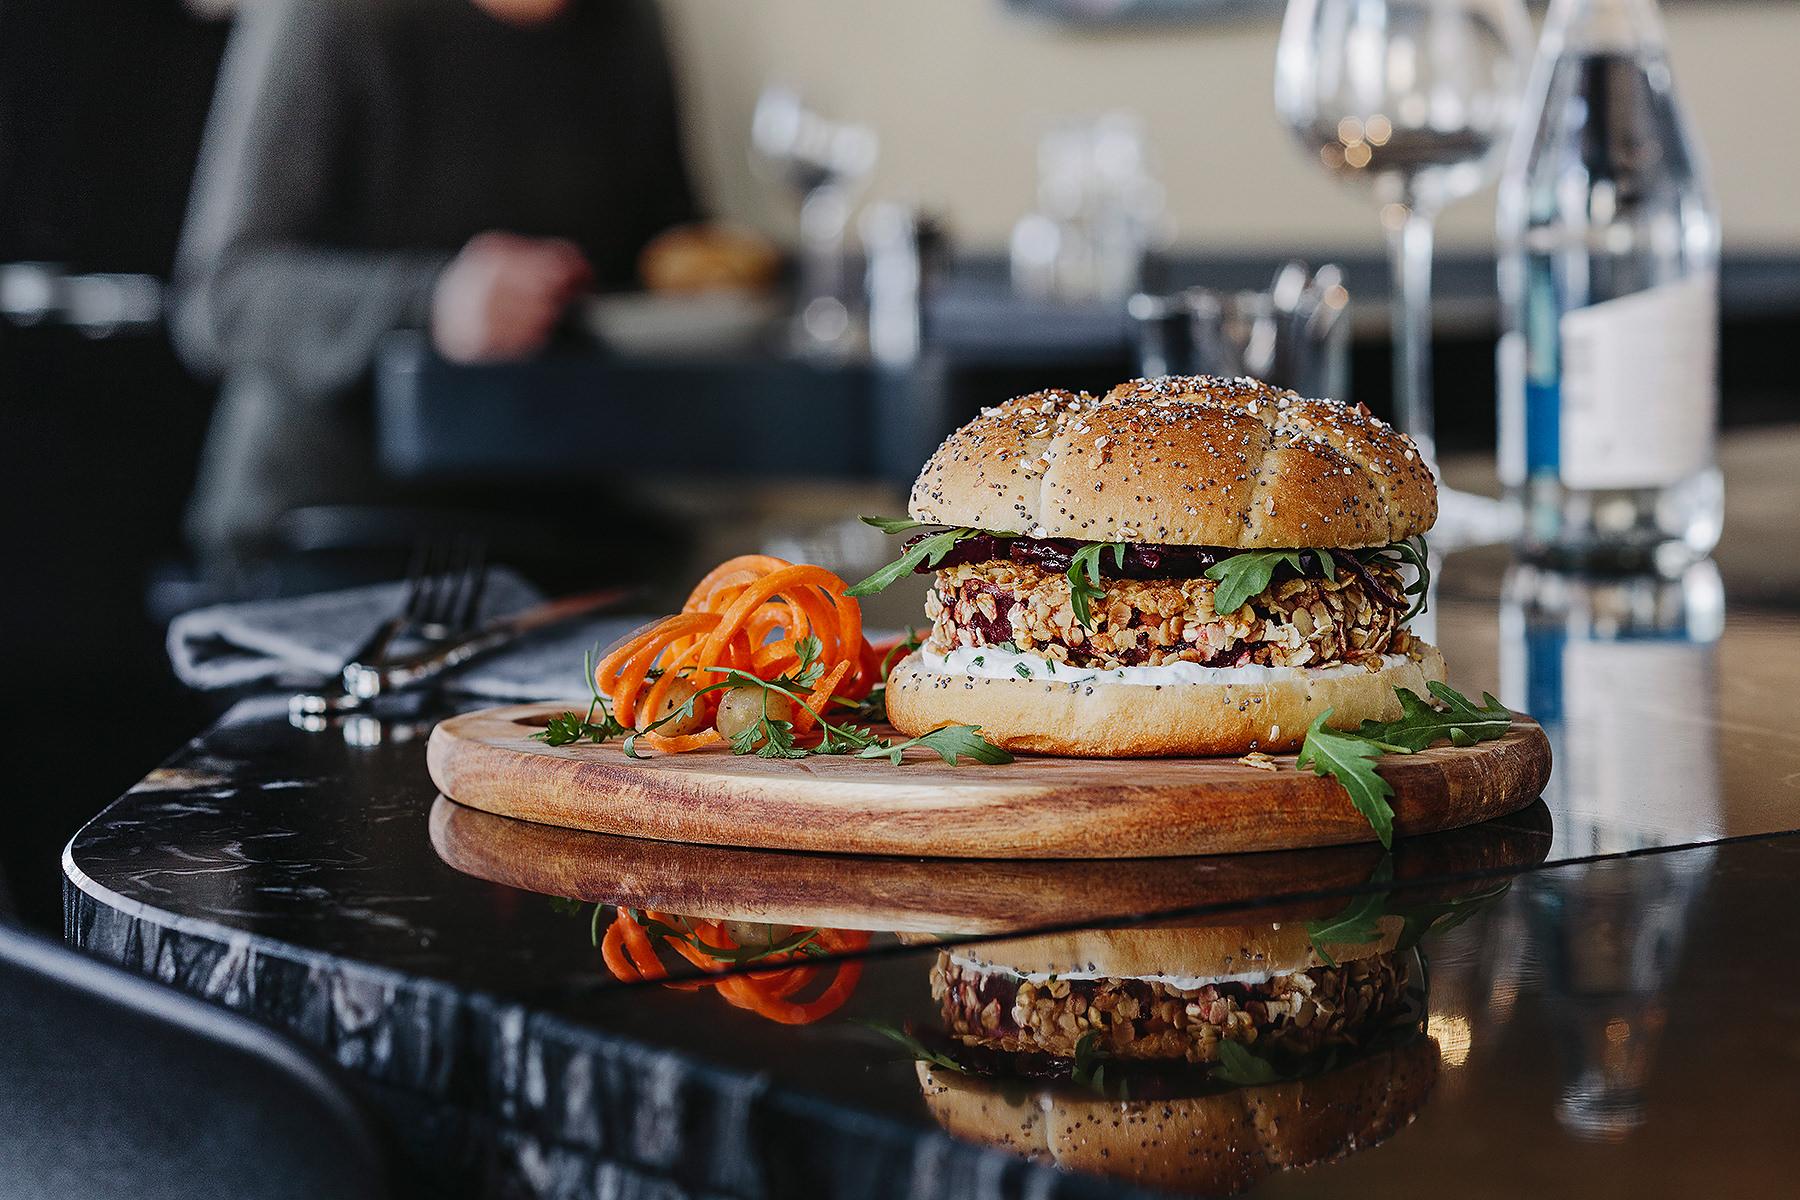 Harrys-burger-betterave-027